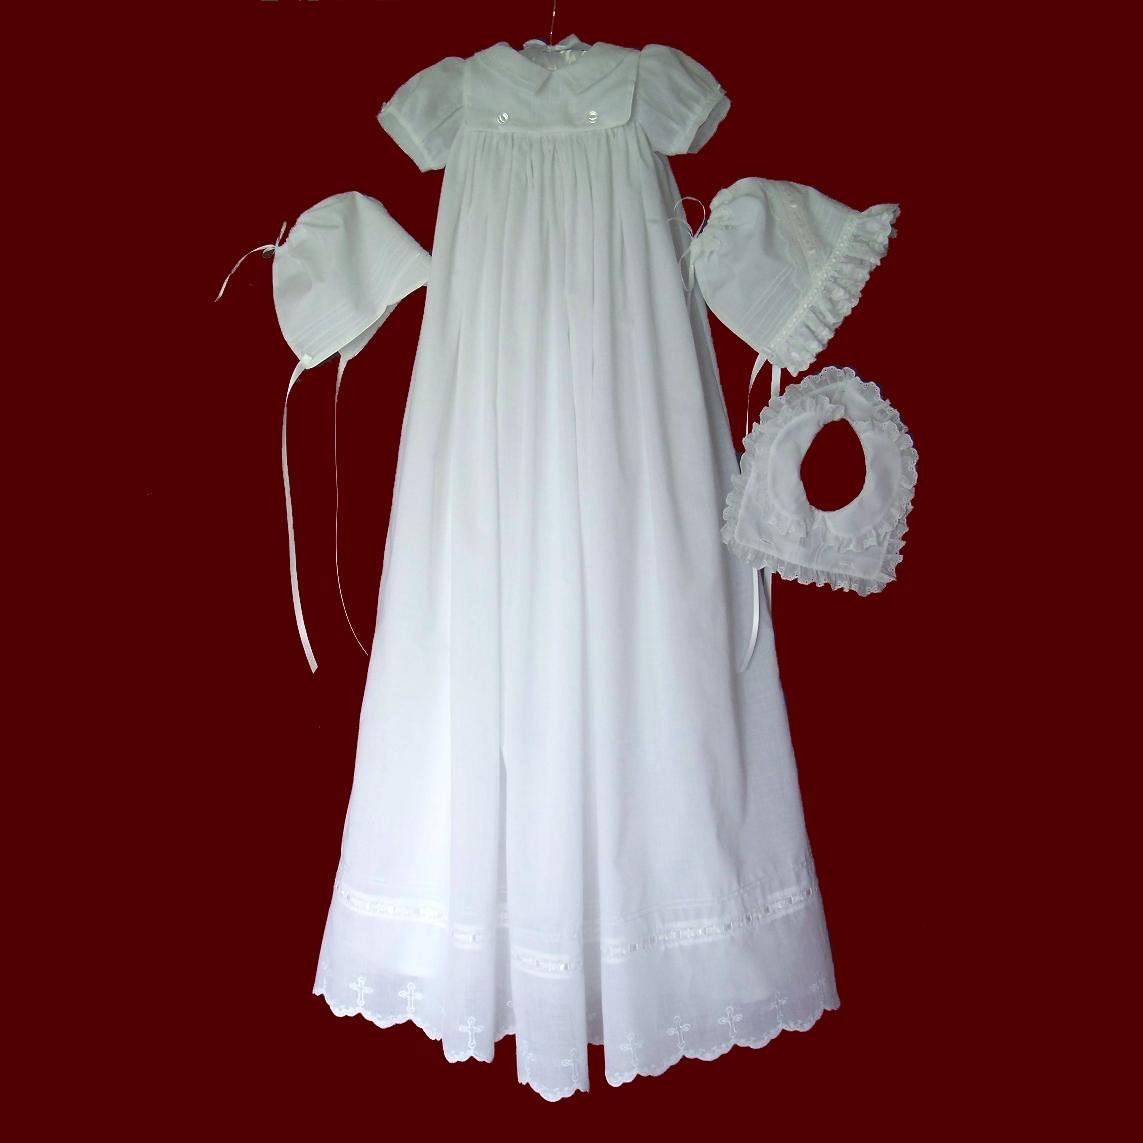 Heirloom Christening Gown With Boy & Girl Detachable Bibs - Boys ...